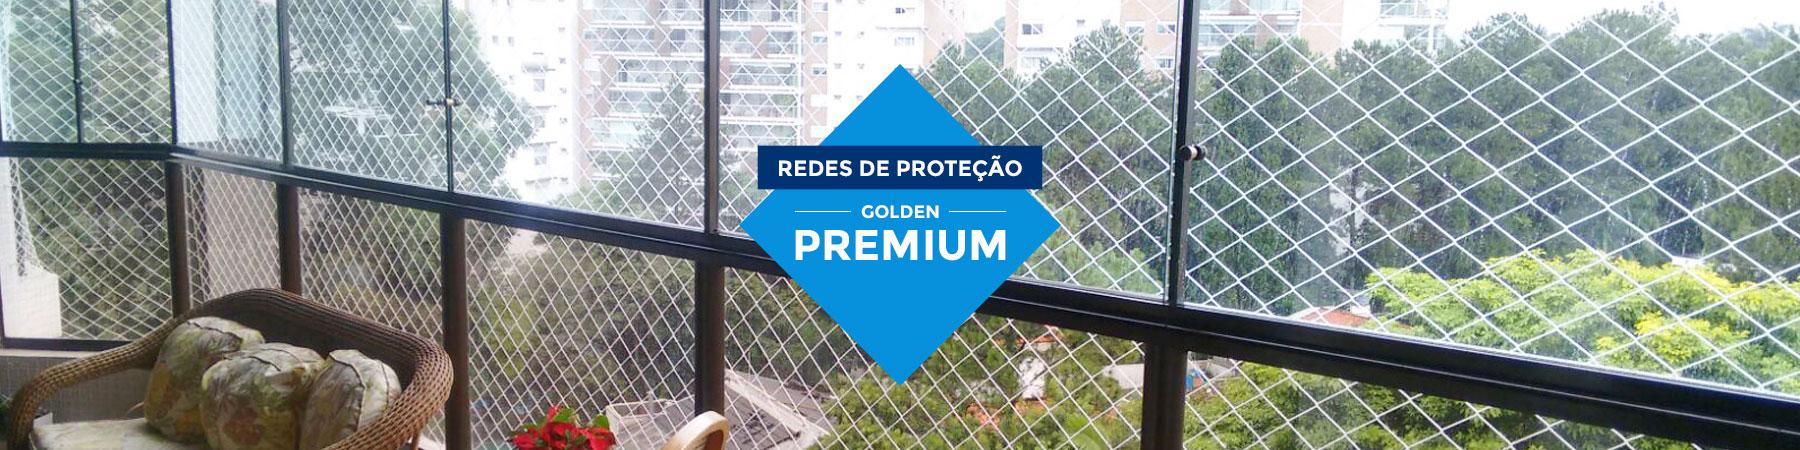 rede-de-protecao-golden-premium02